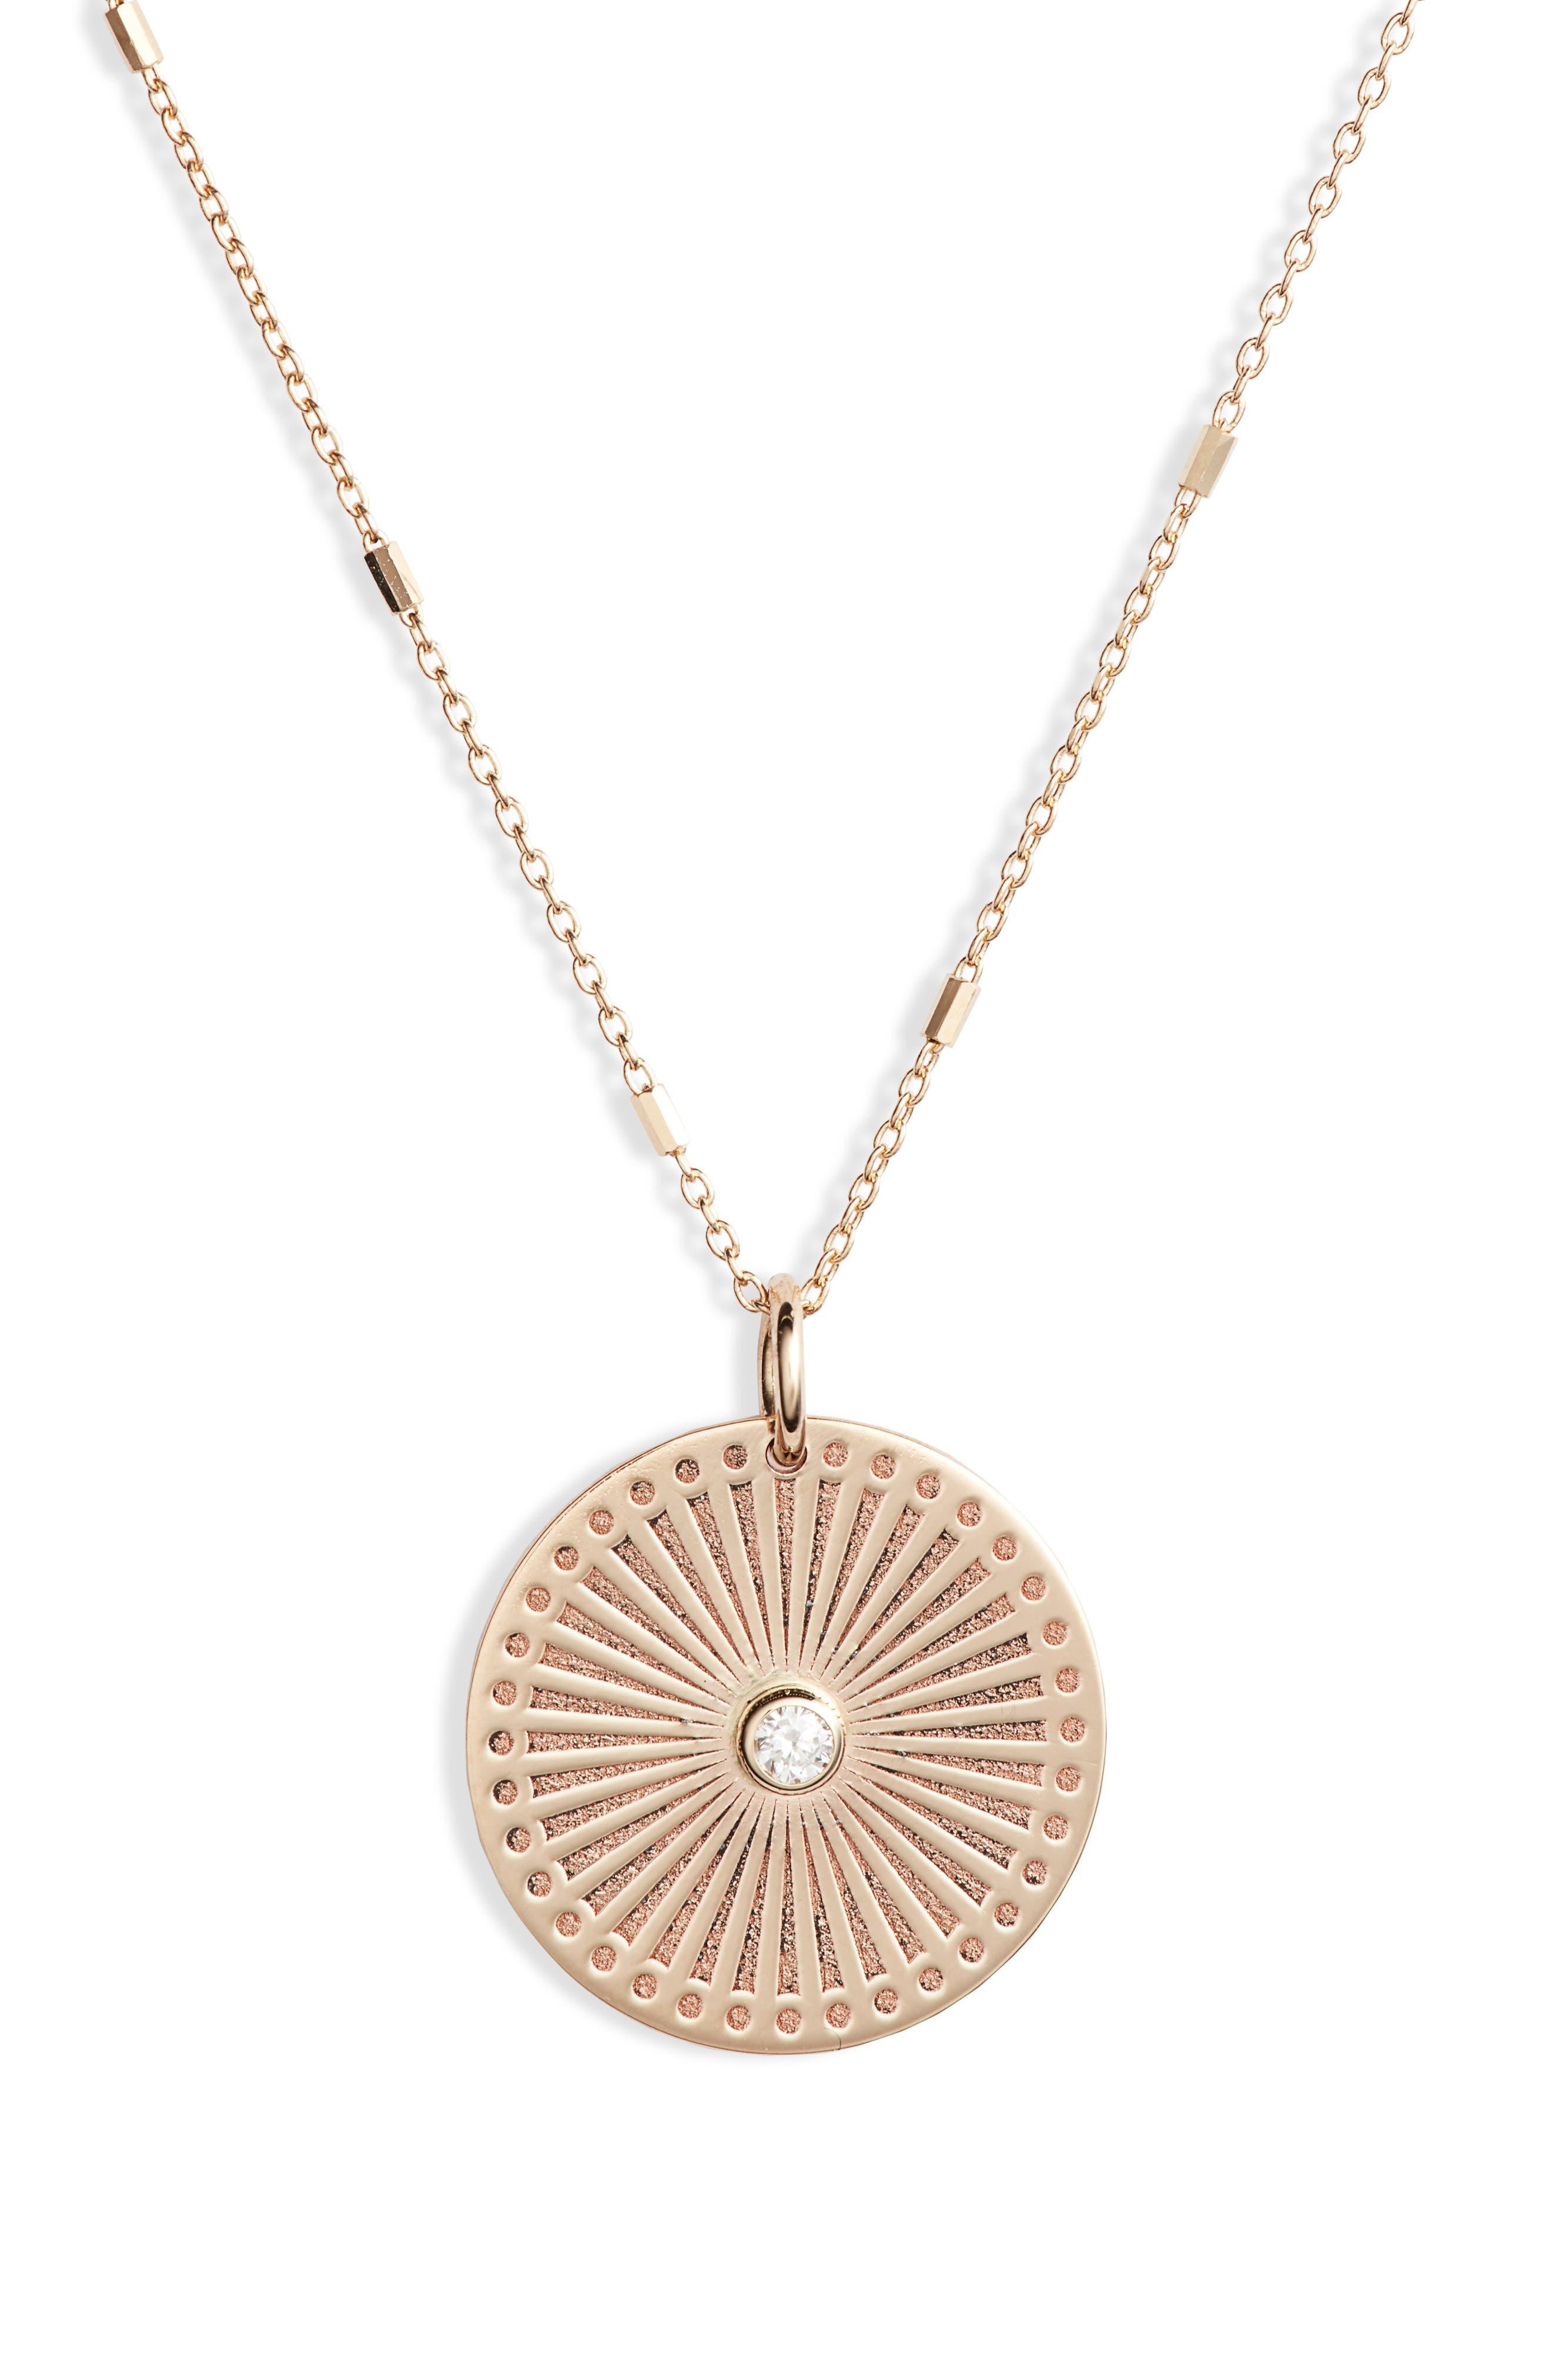 Zoe Chicco Small Sunbeam Diamond Medallion Necklace